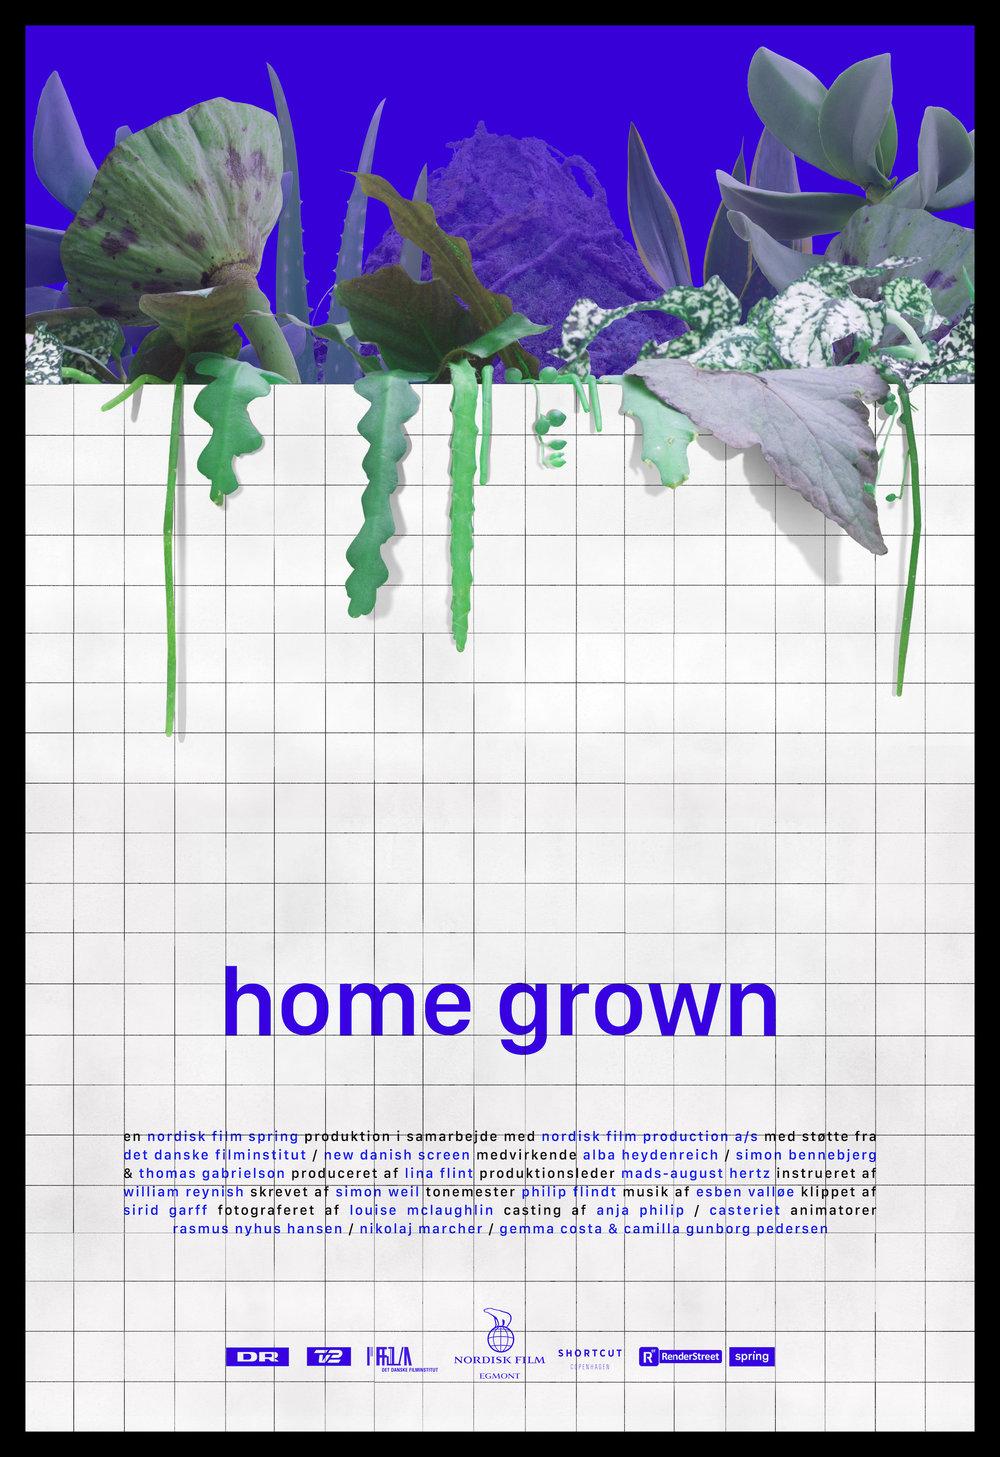 HomePoster